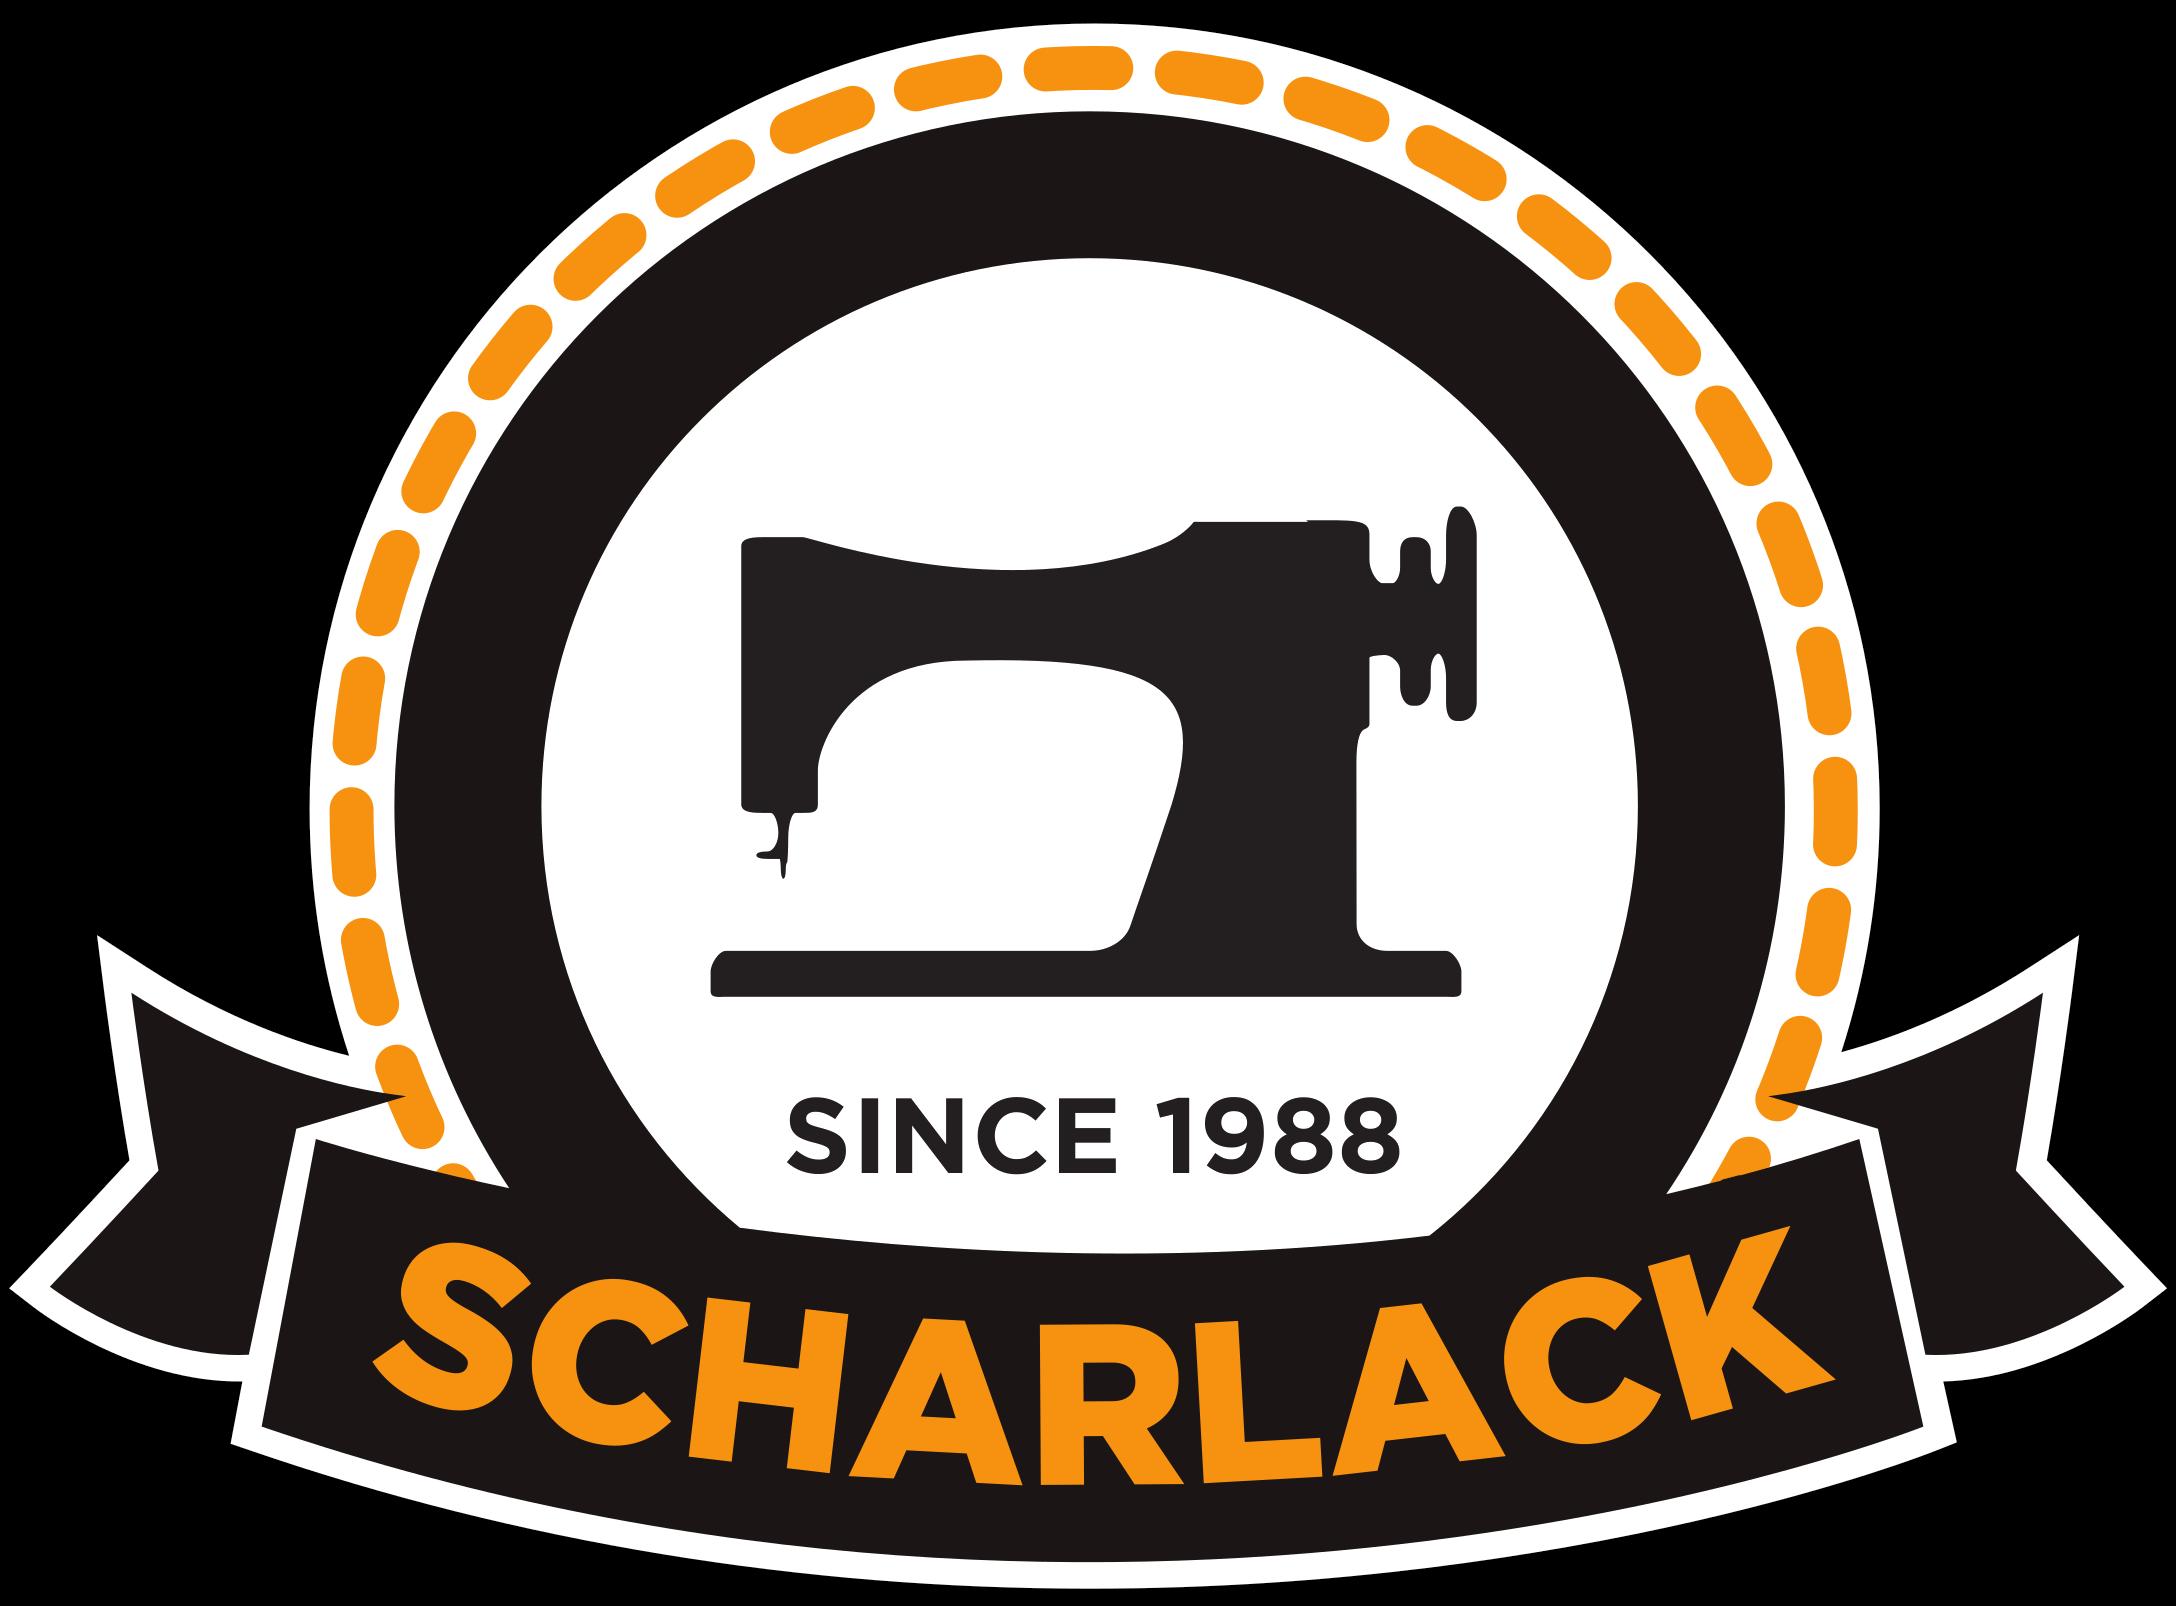 Scharlack